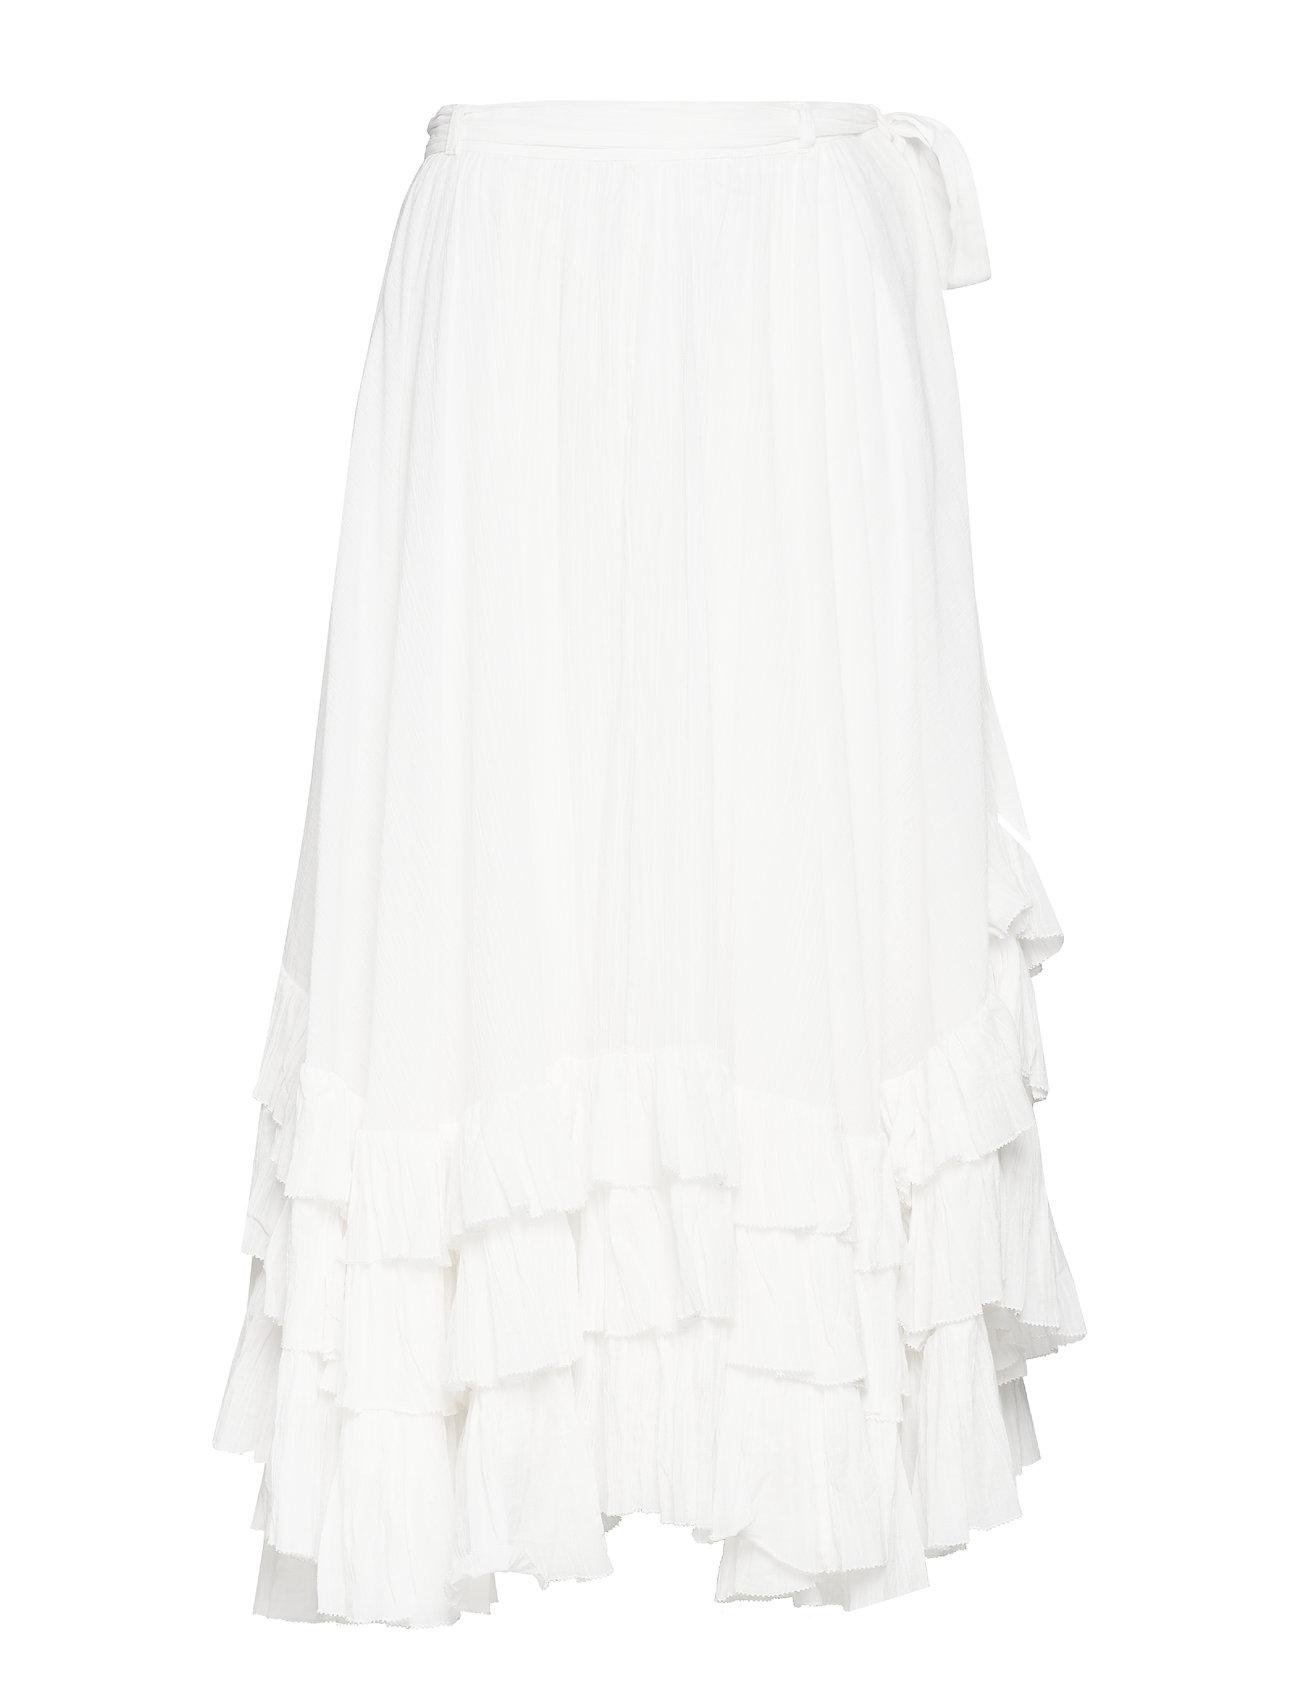 Polo Ralph Lauren Belted Cotton Crinkle Skirt